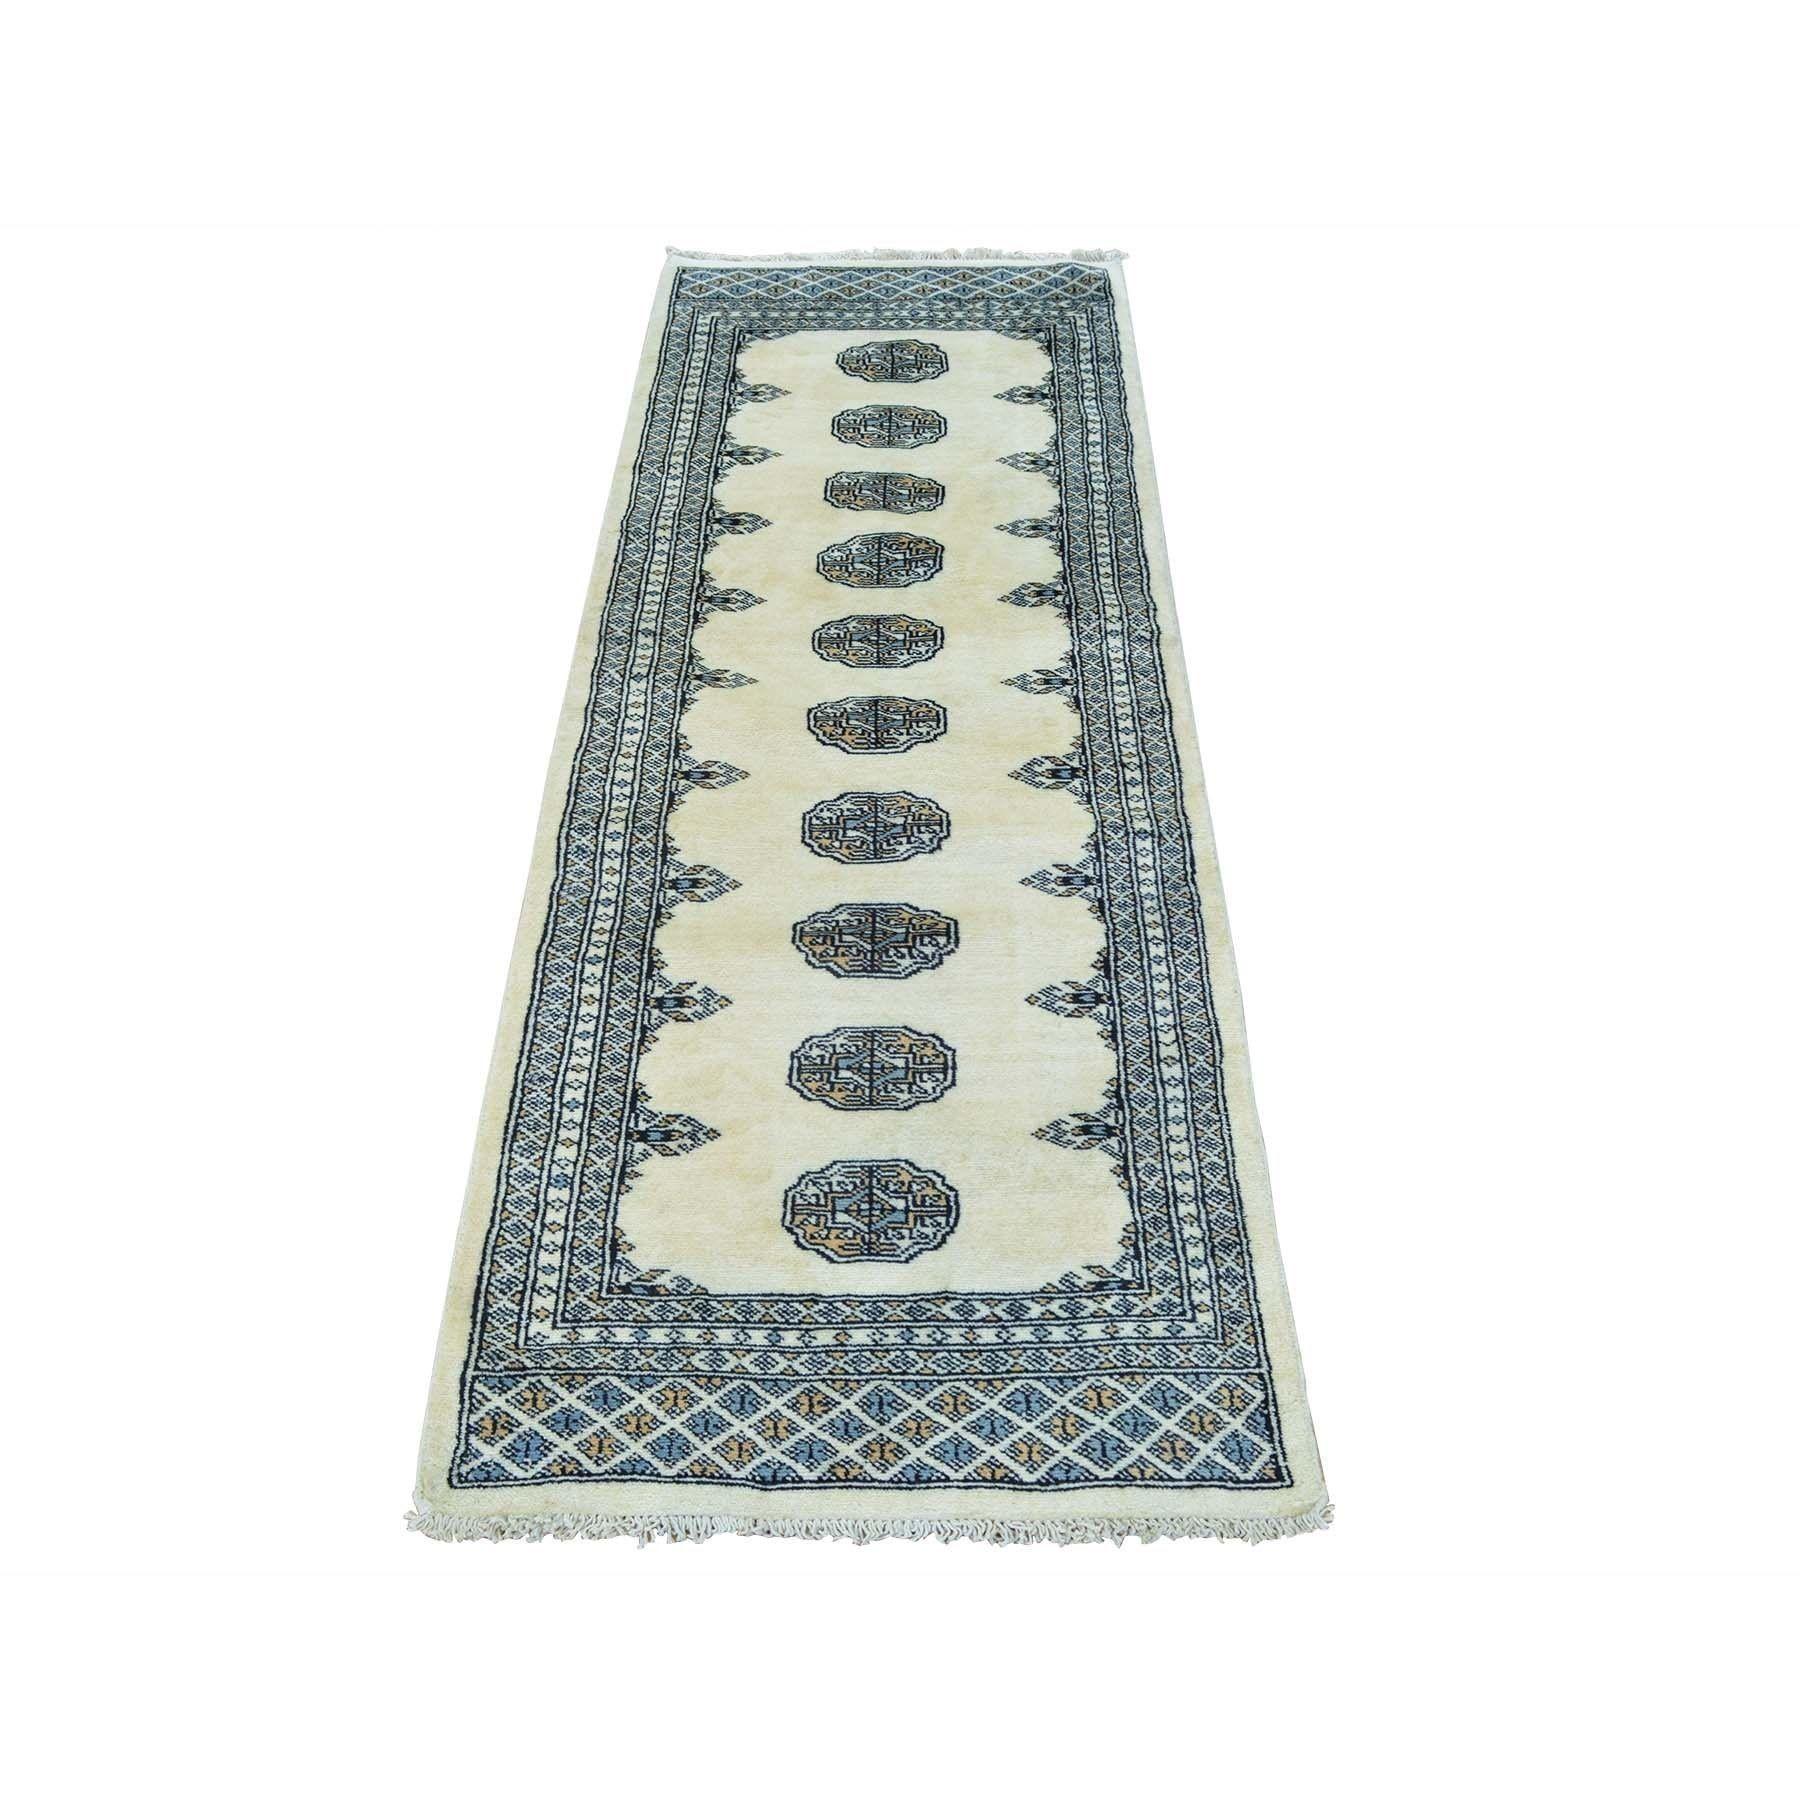 "1800getarug Elephant Feet Design Bokara Handmade Oriental Rug (2'1 x 5'7) (Exact Size: 2'1"" x 5'7""), Ivory, Size 2' x 6'"